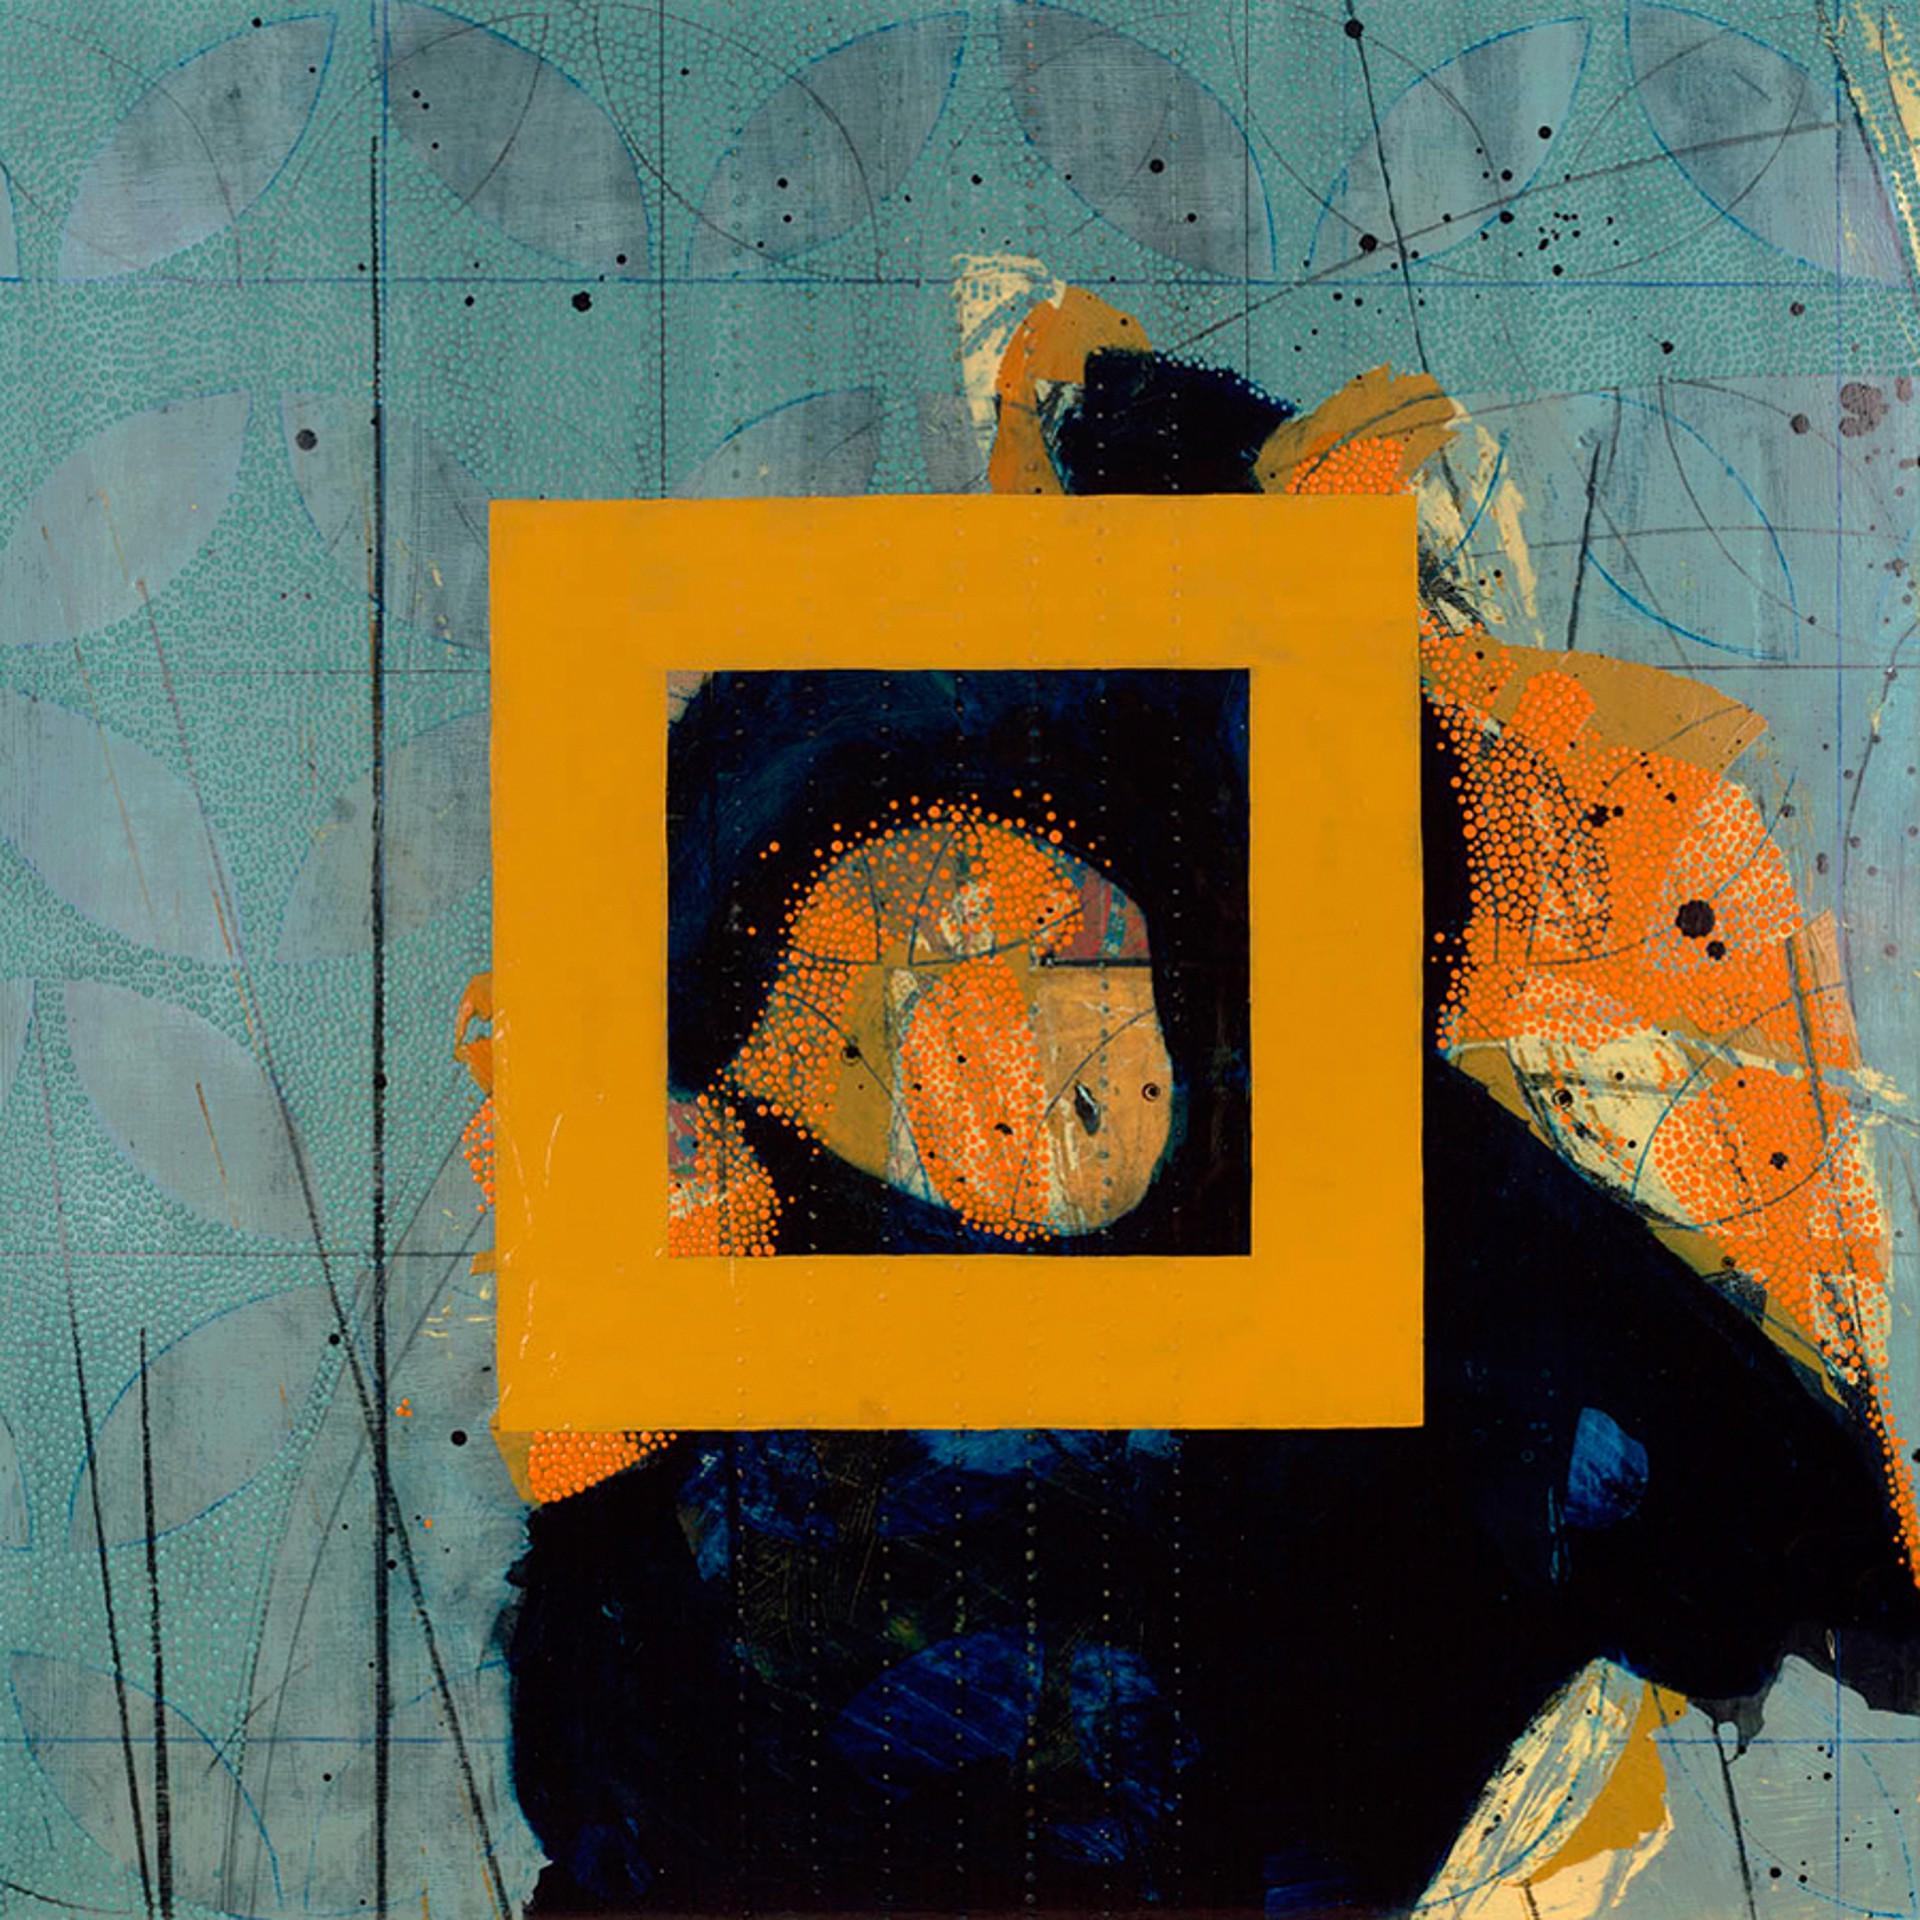 Quilt and Poppy 3 by Nina Tichava